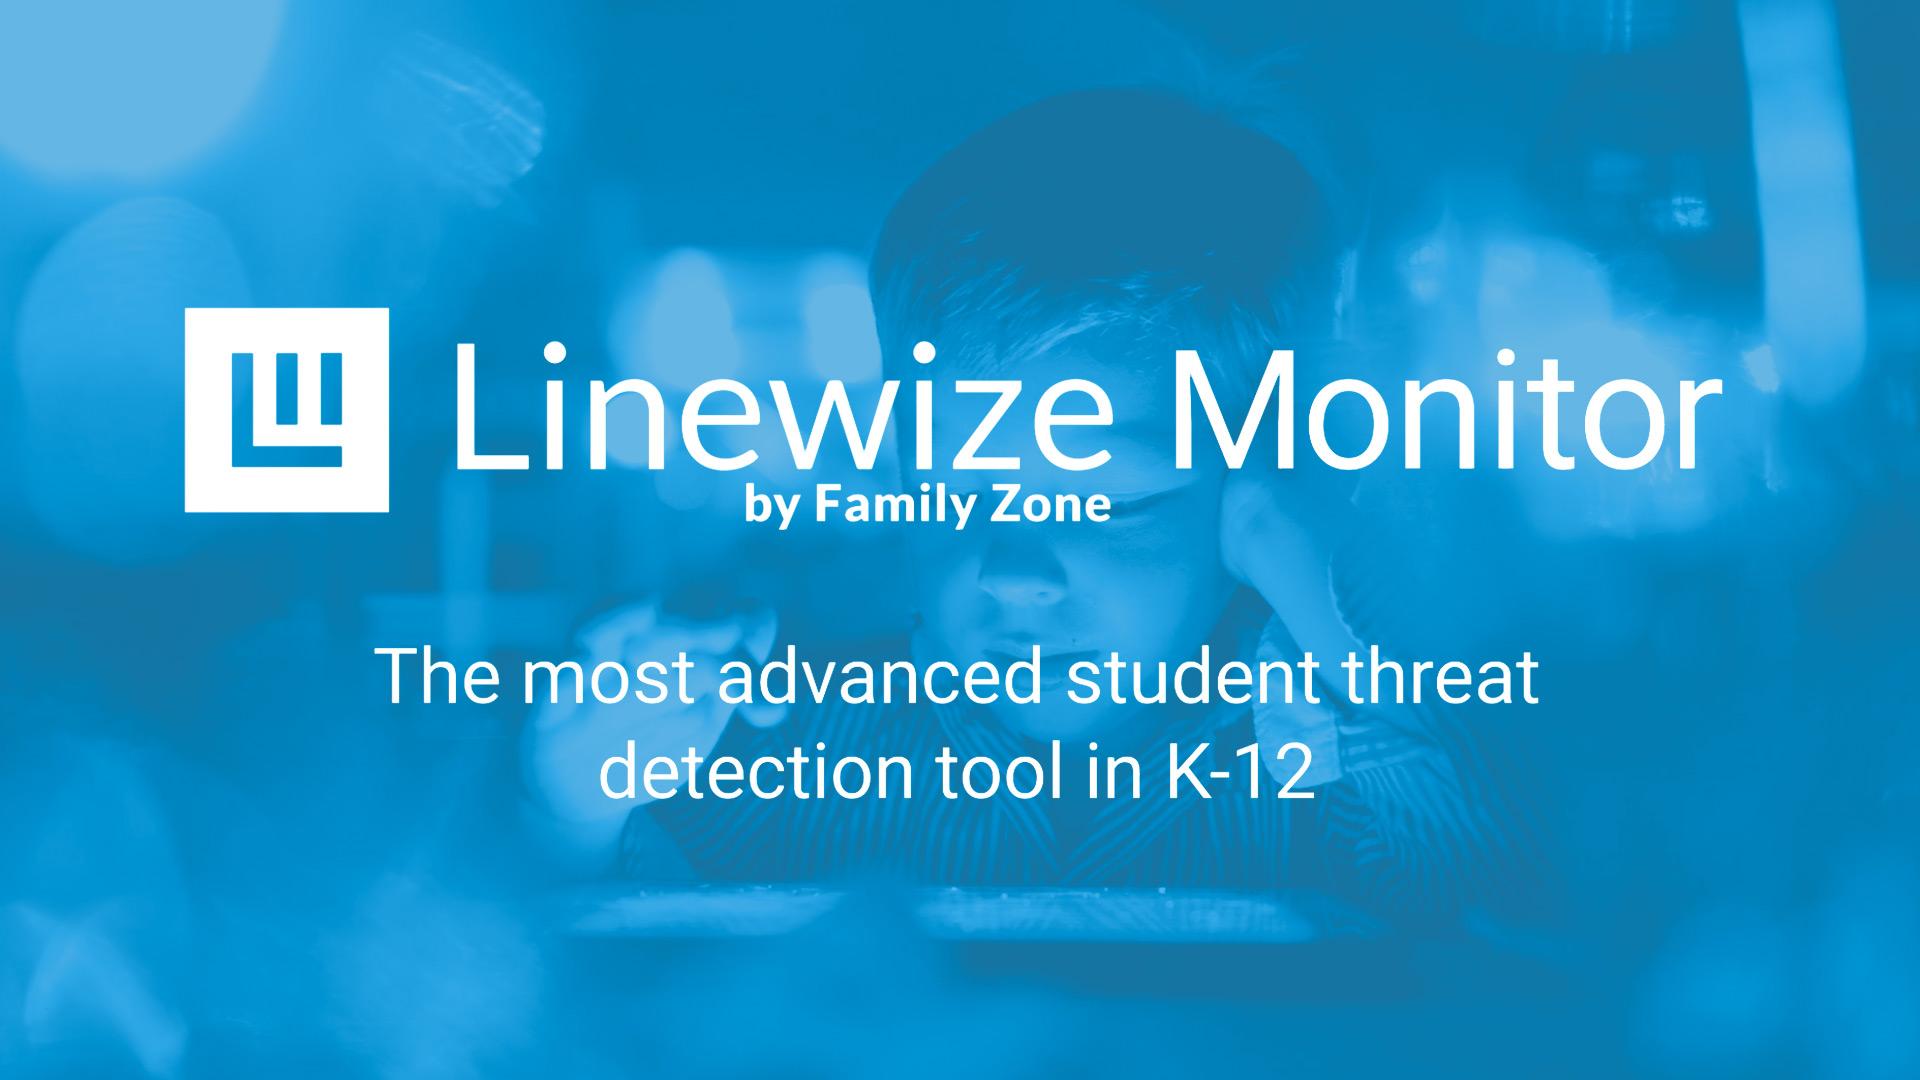 US Linewize Monitor 4K video-1